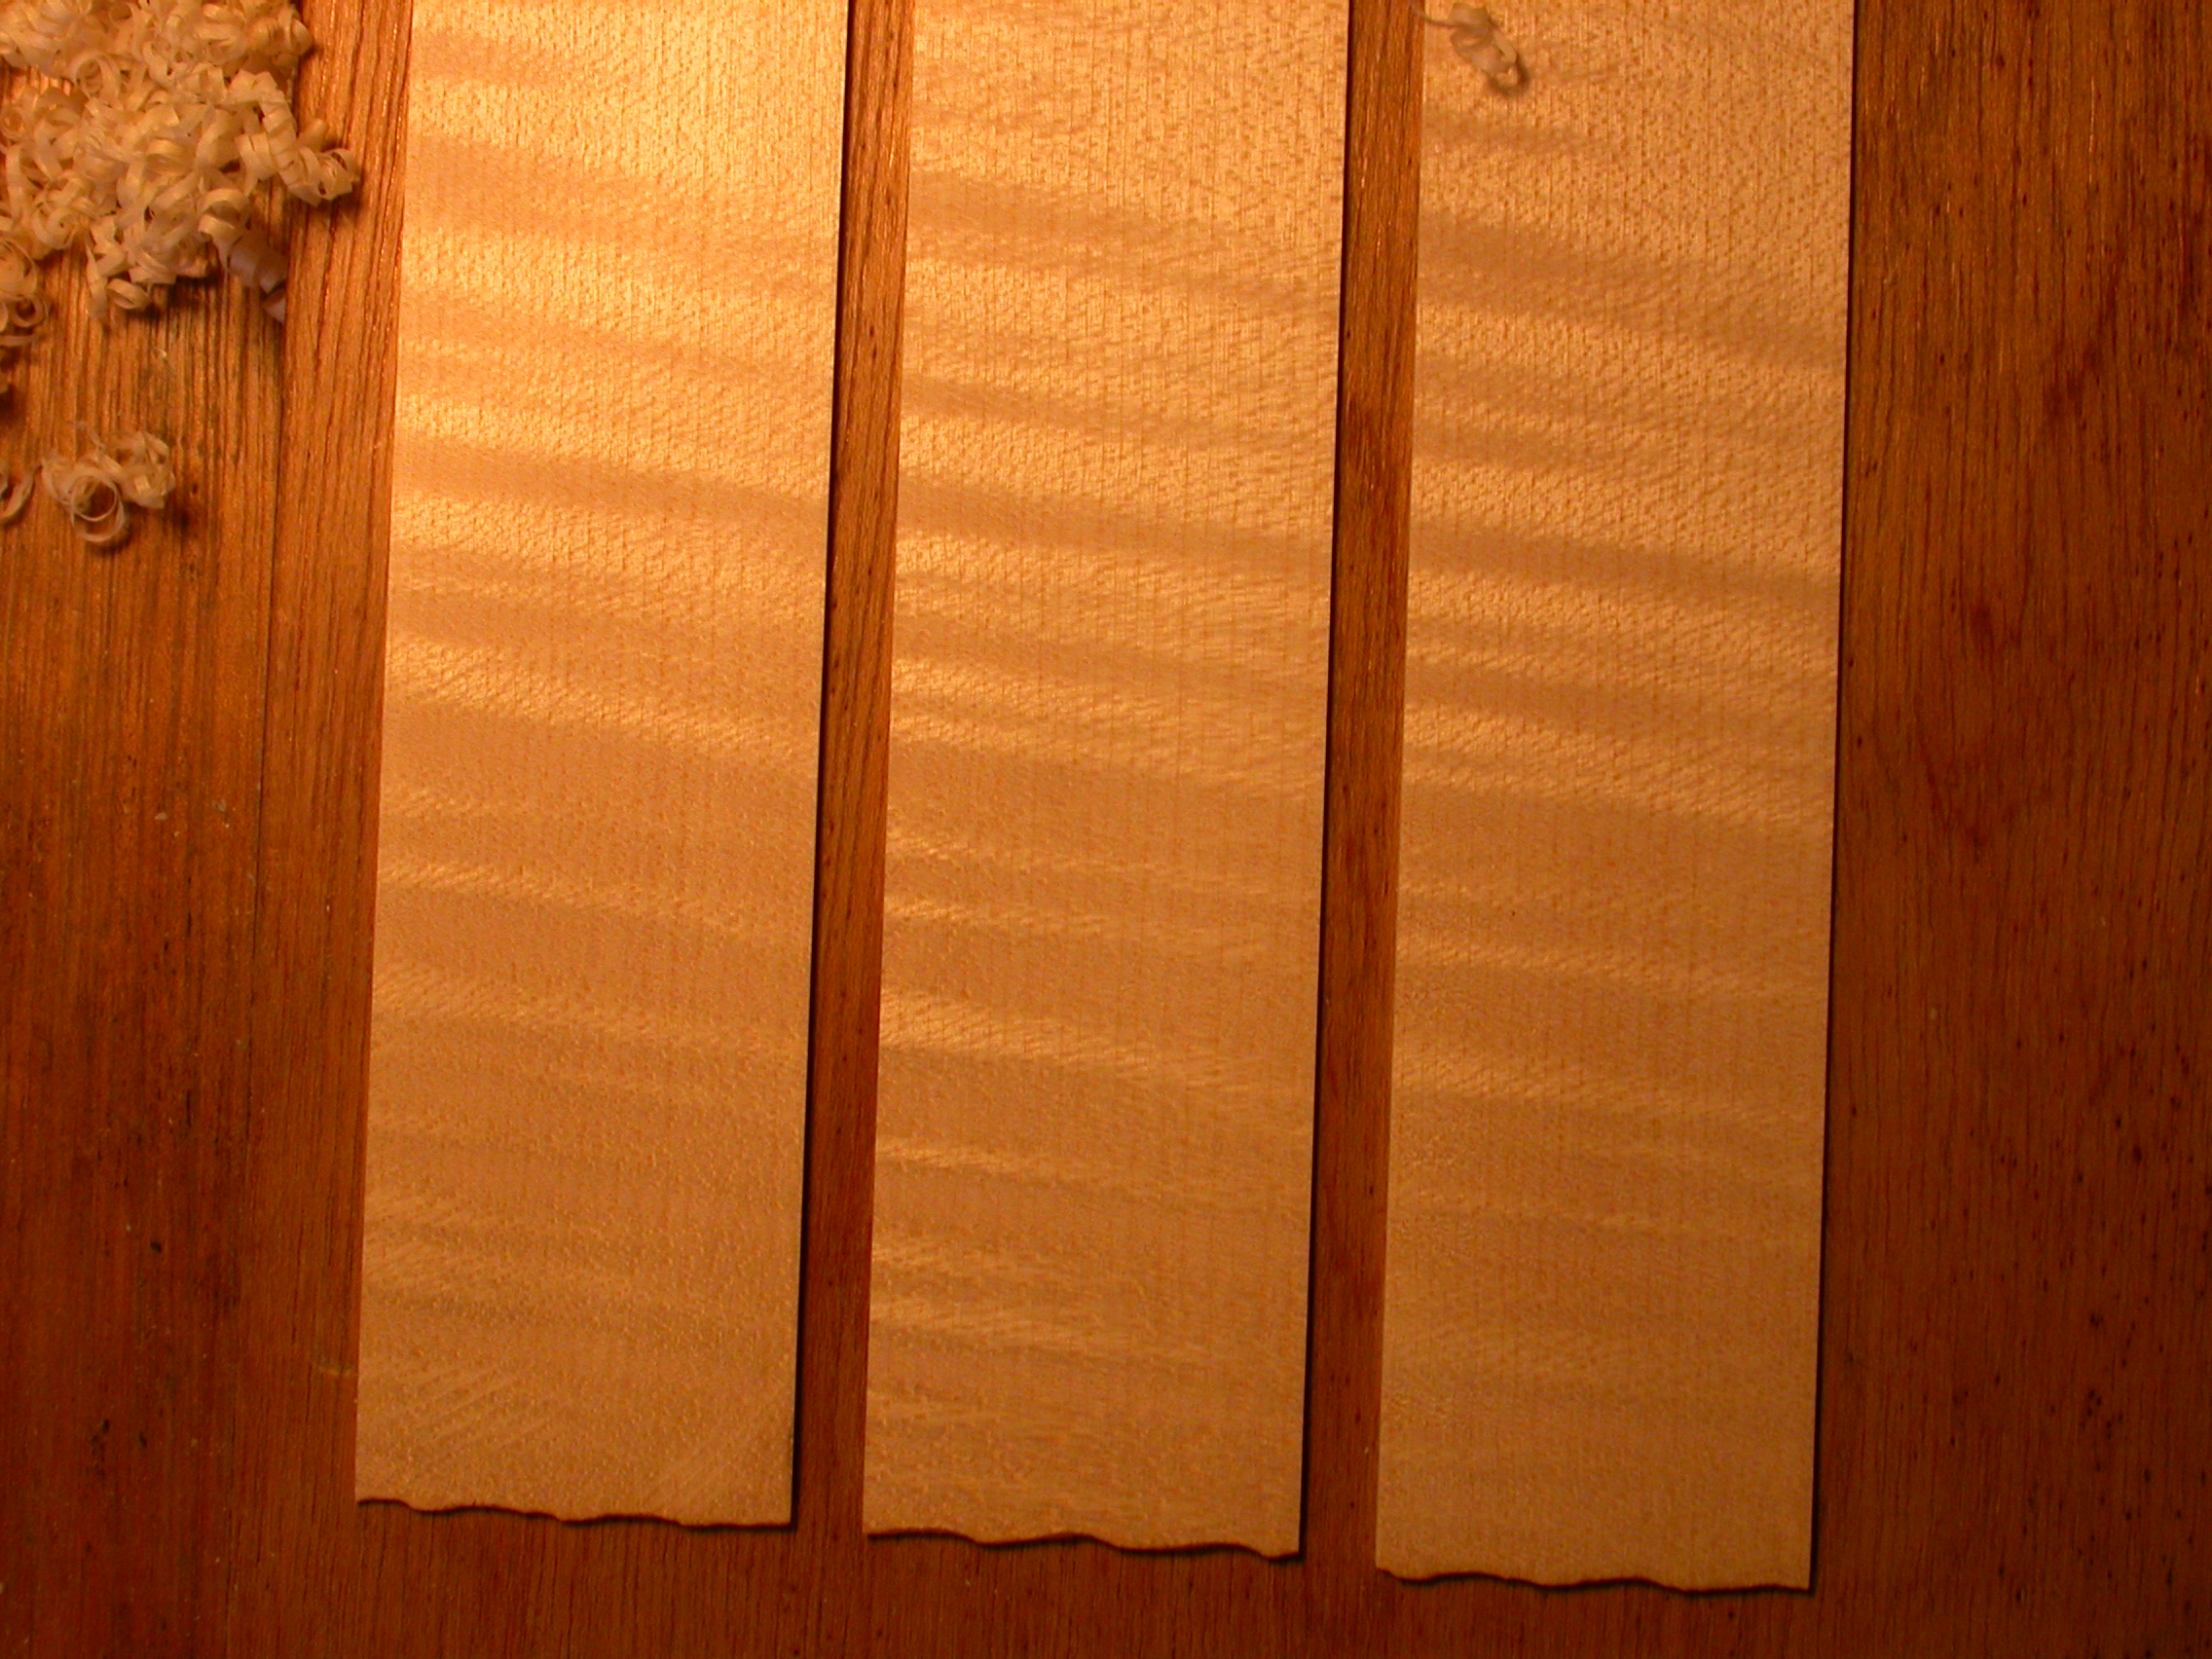 paul wood instrument maker school craft craftsman soon to be instrument curls hi-res